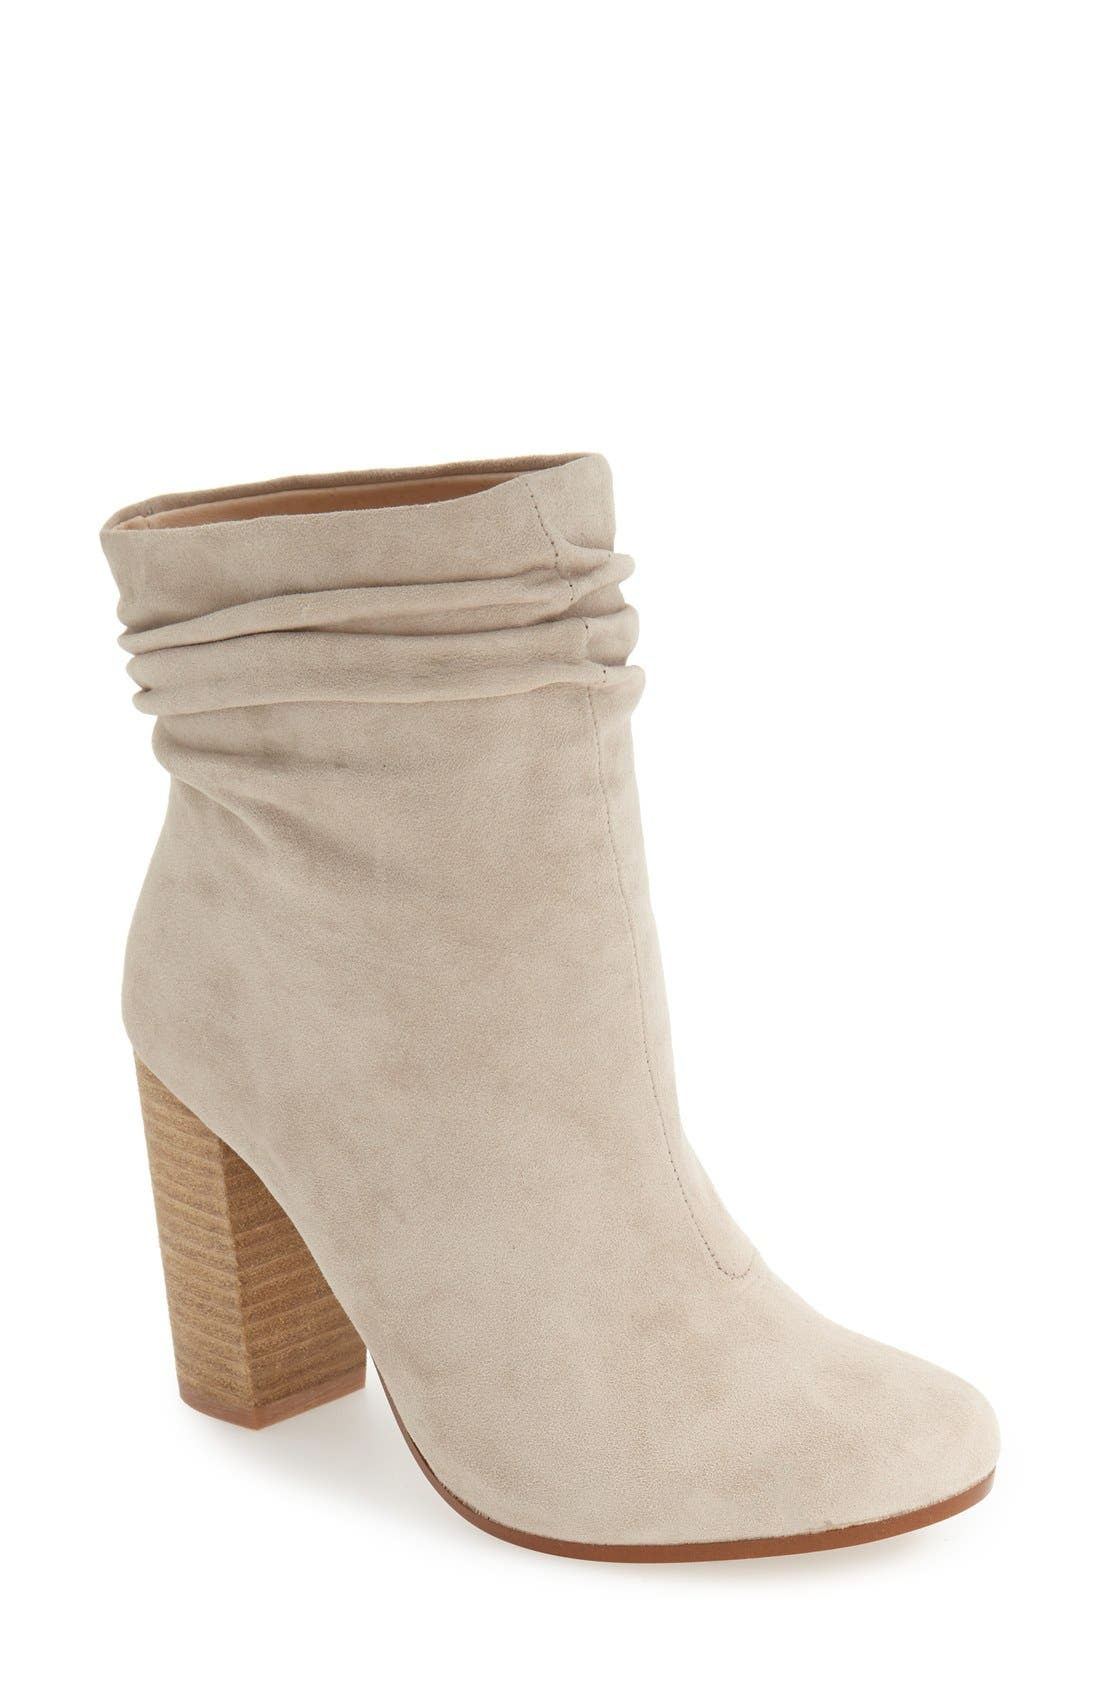 Main Image - Kristin Cavallari 'Georgie' Block Heel Boot (Women)